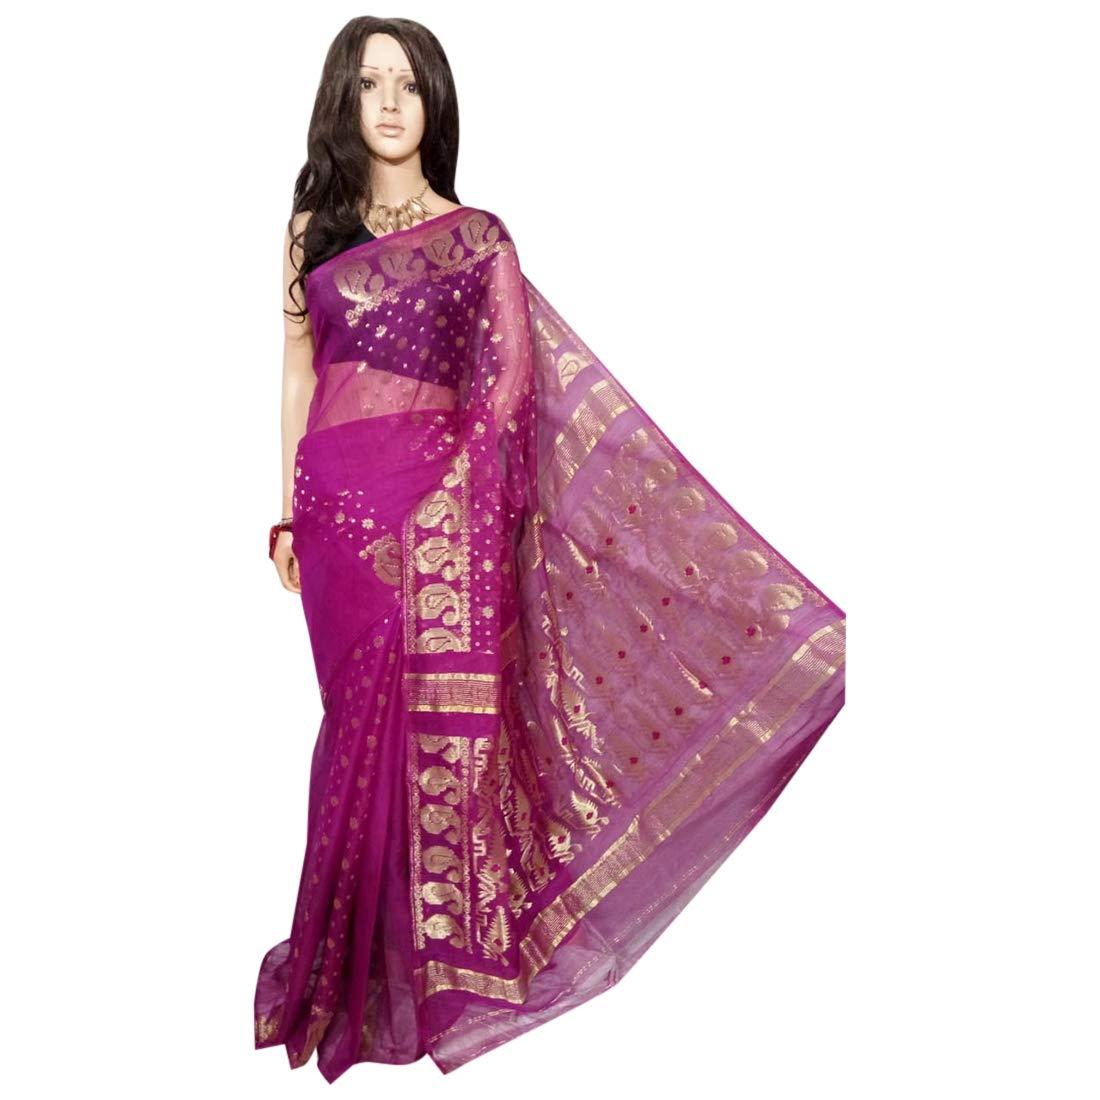 Indian Ethnic Handloom Purple Zari work Zamdani Saree Party Women Wear Sari 101a